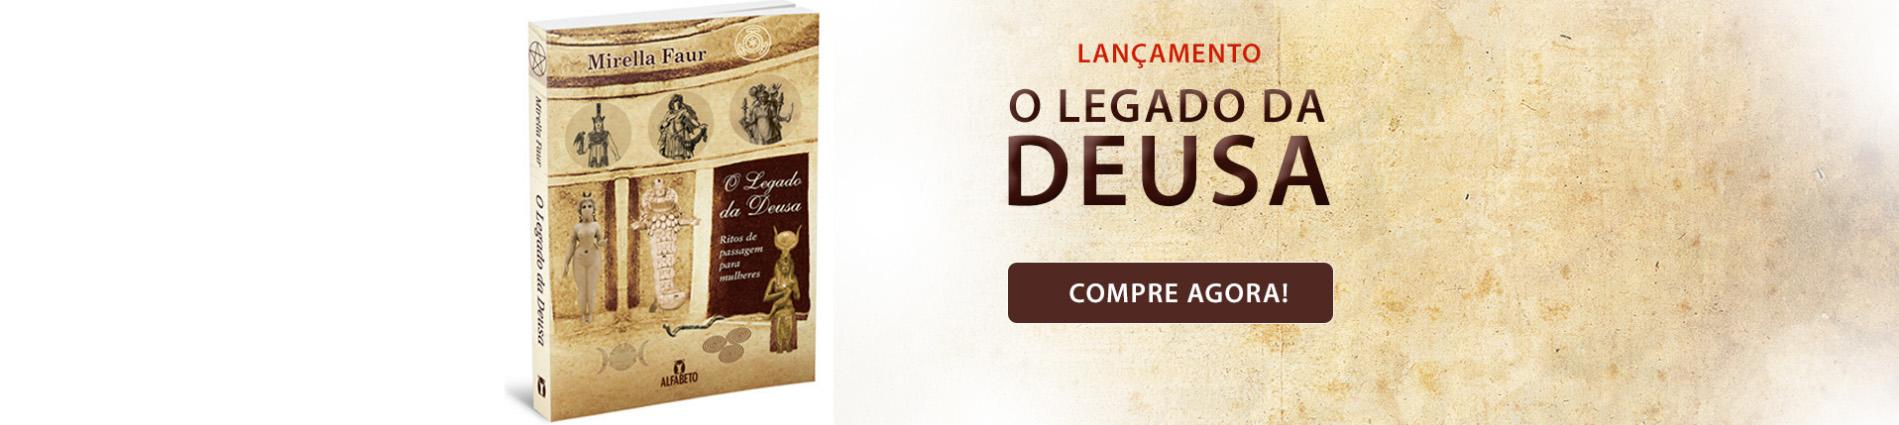 https://cdn.brasilesoterico.com/imagens_banners/adaca0c2934eeaf886fd6f1774c4184f.jpg